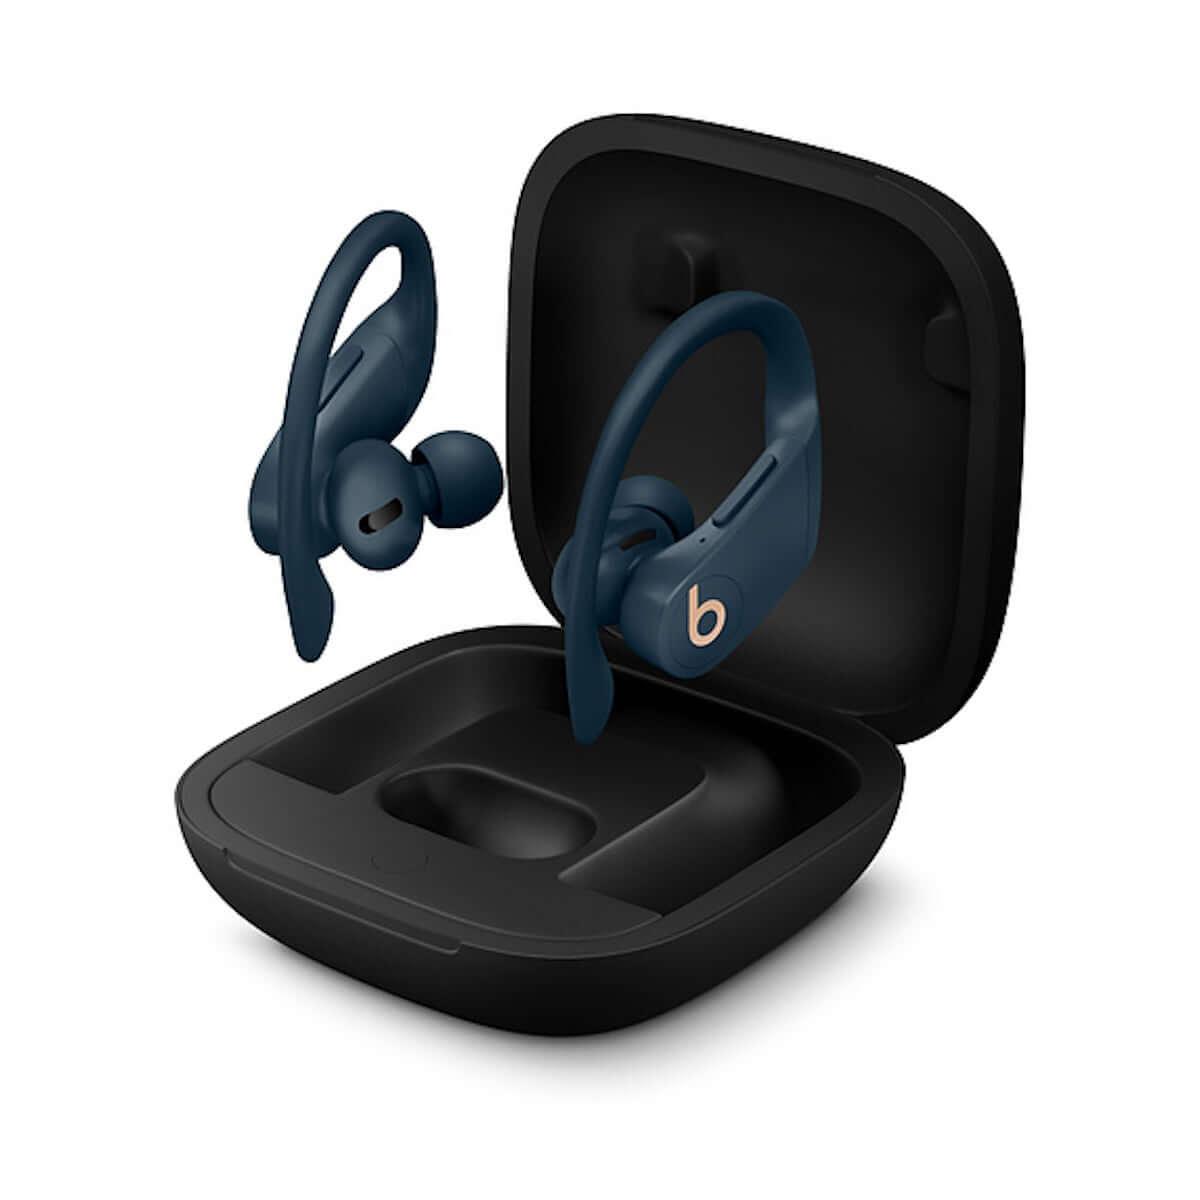 3b646361f57fff Apple × Beats by Dr. Dreの新製品「Powerbeats Pro」が5月に発売決定 ...